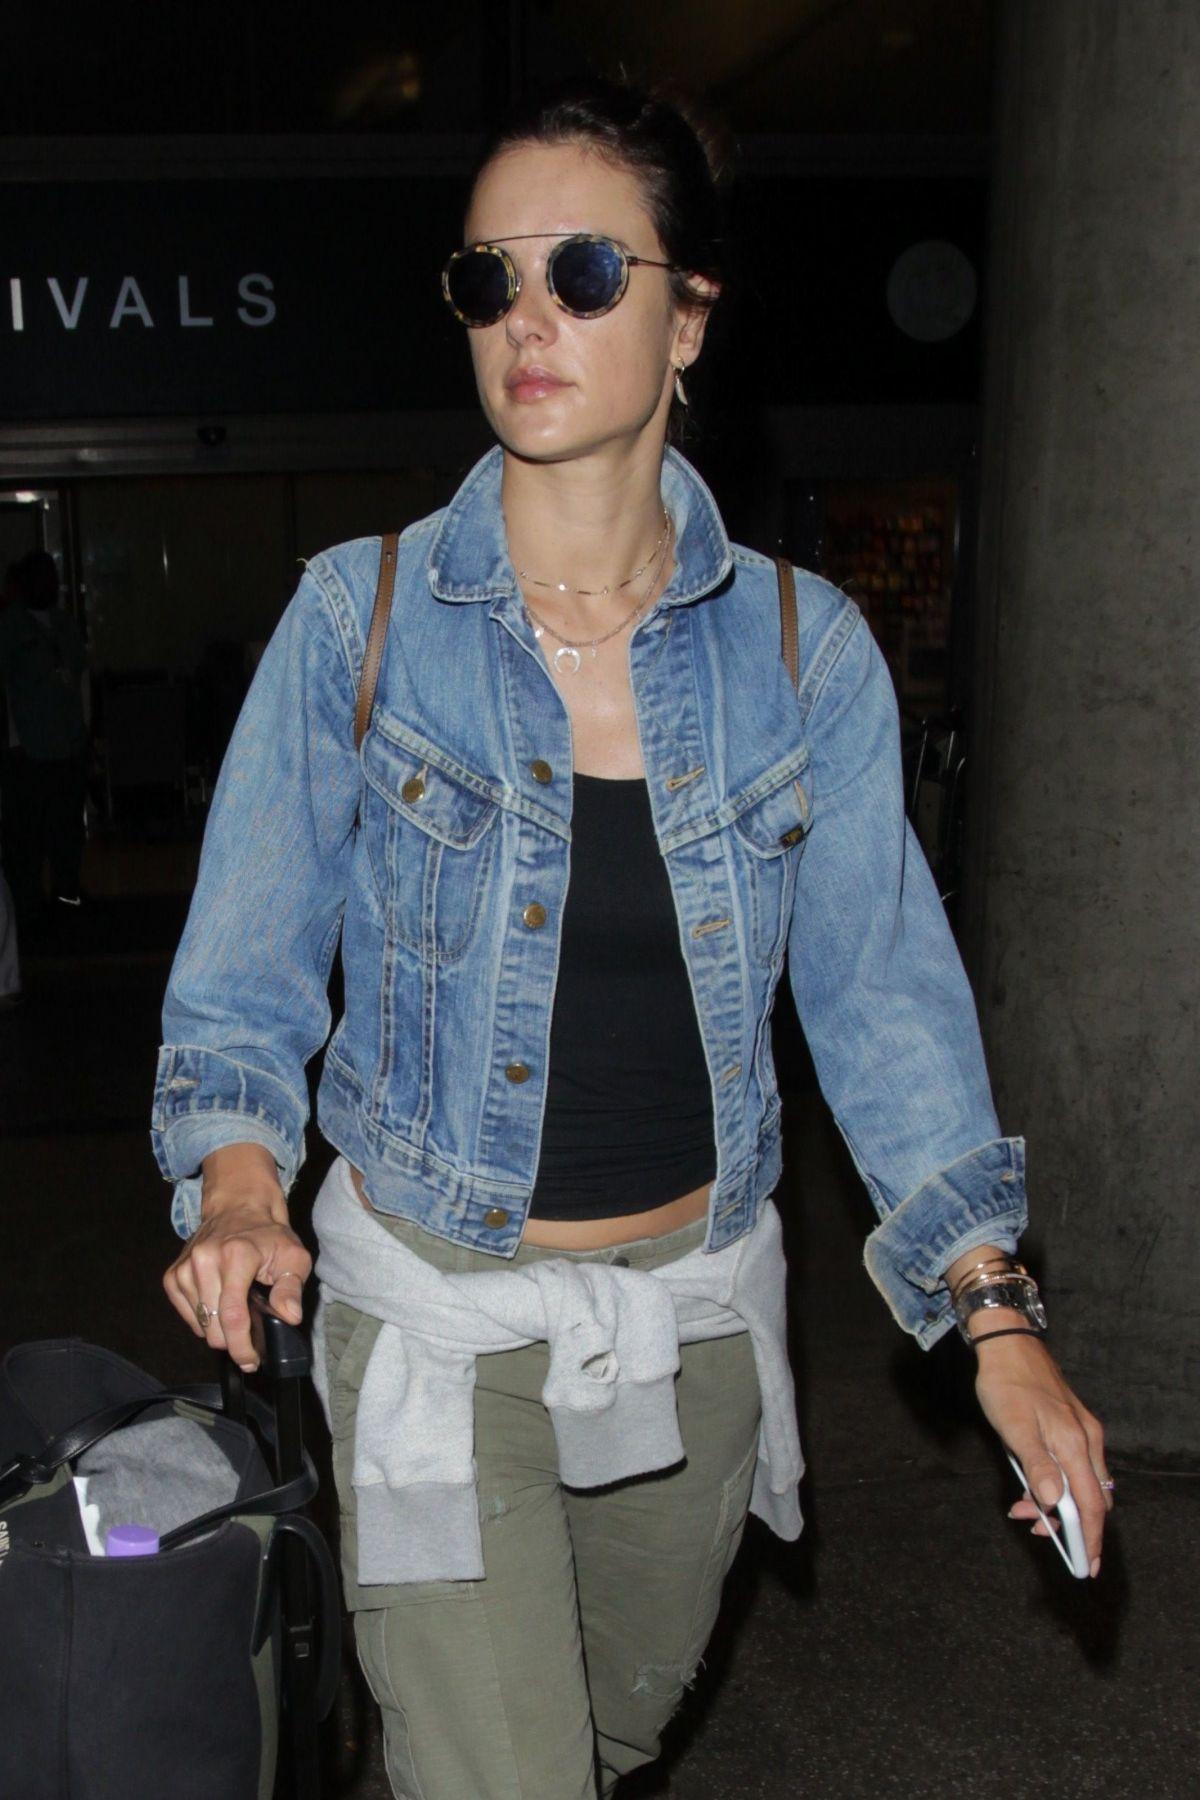 ALESSANDRA AMBROSIO at Los Angeles International Airport 06/09/2017